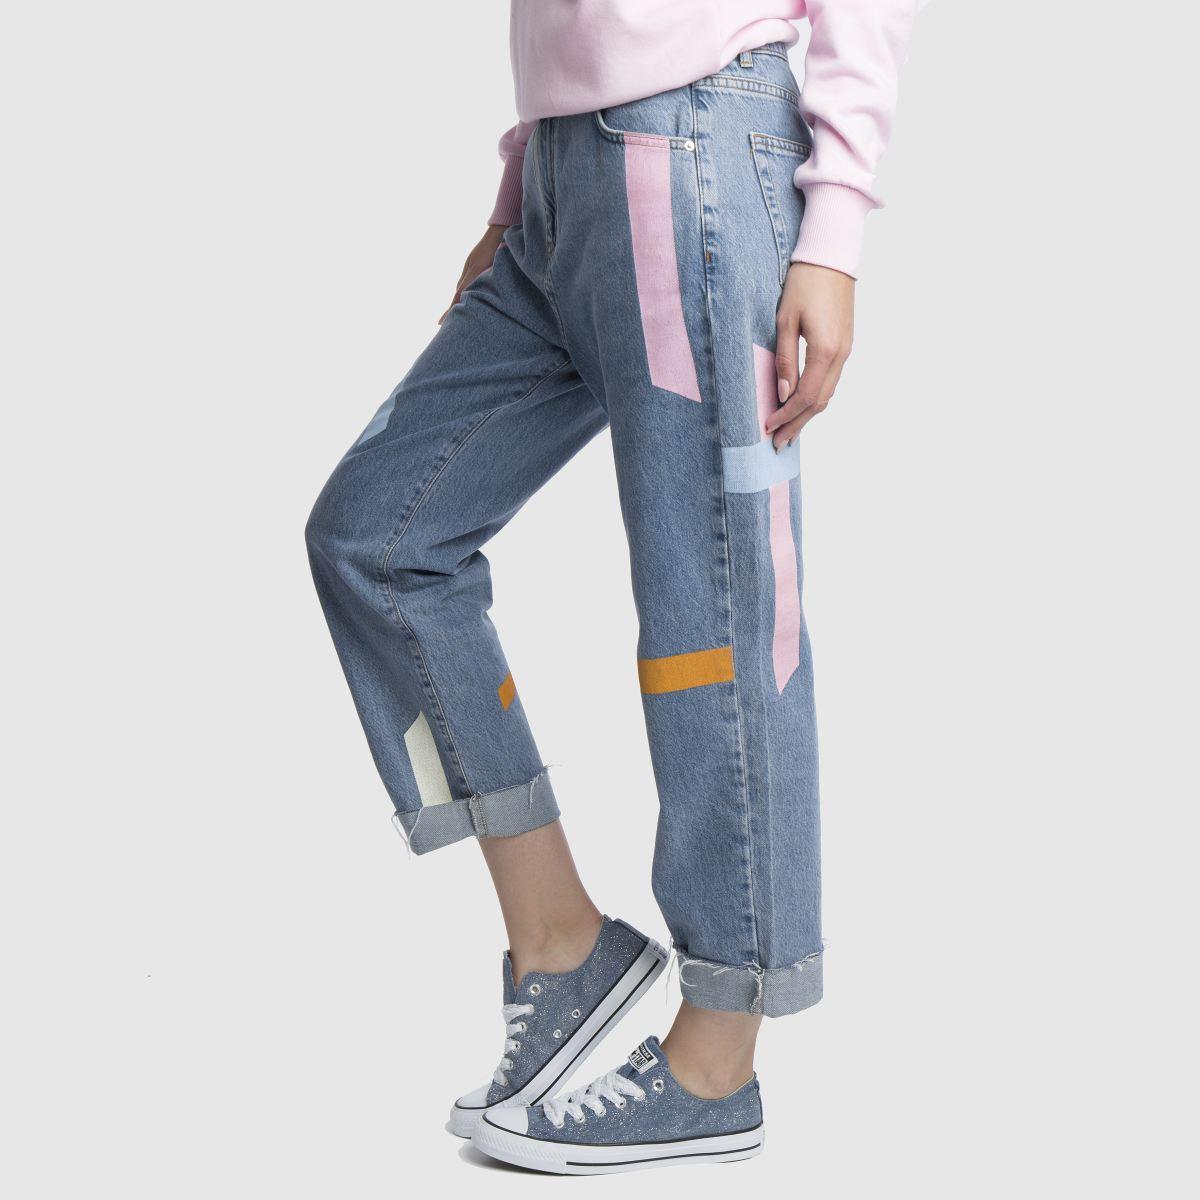 Damen Marineblau-weiß converse All Star Denim Glitter Ox Sneaker | schuh Gute Qualität beliebte Schuhe